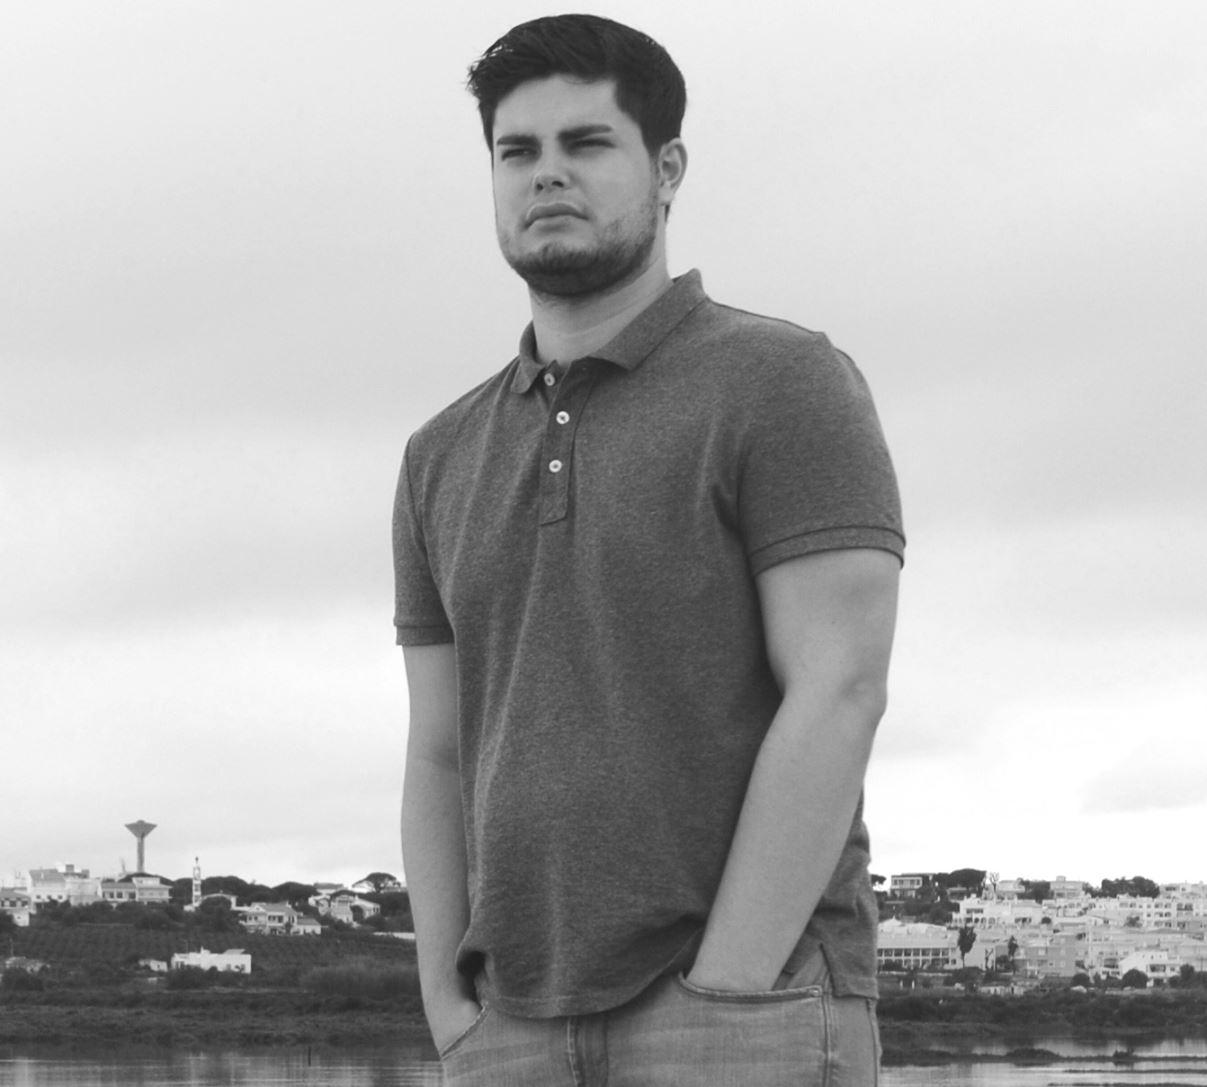 Filipe Batista